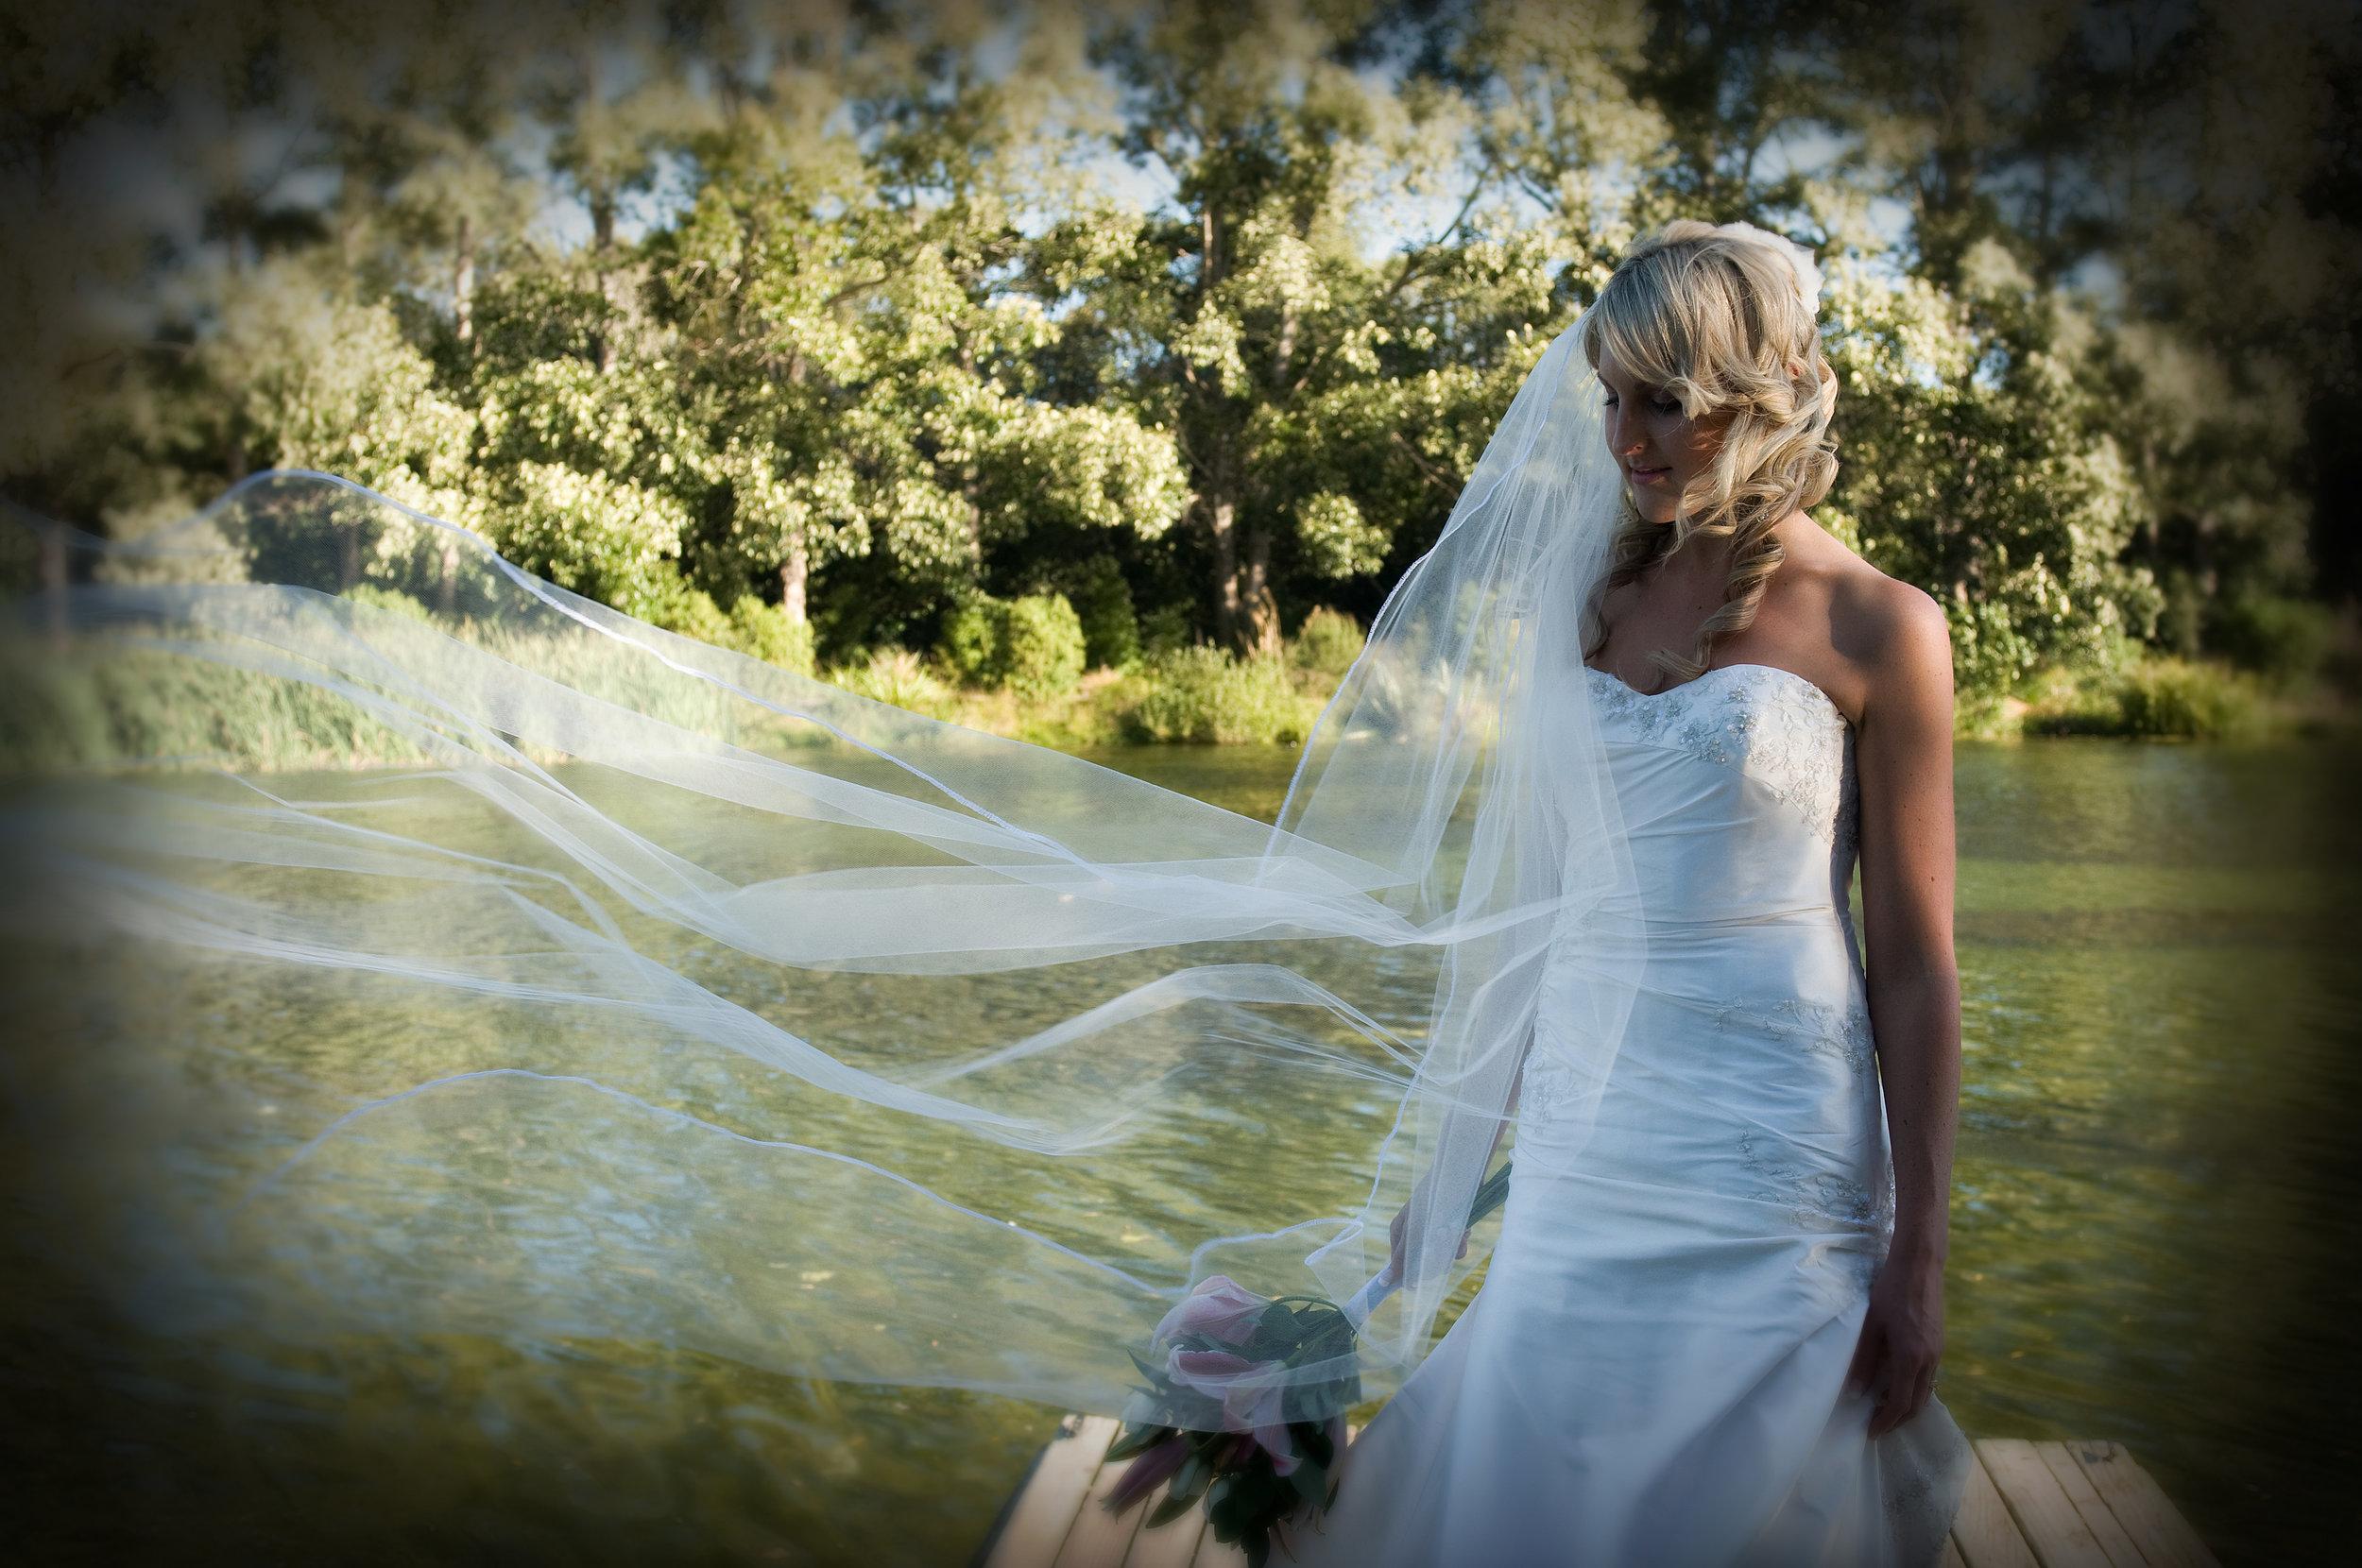 Sara-Jayne - silk dupion - christchurch bridal - Tracey Alsopp photography